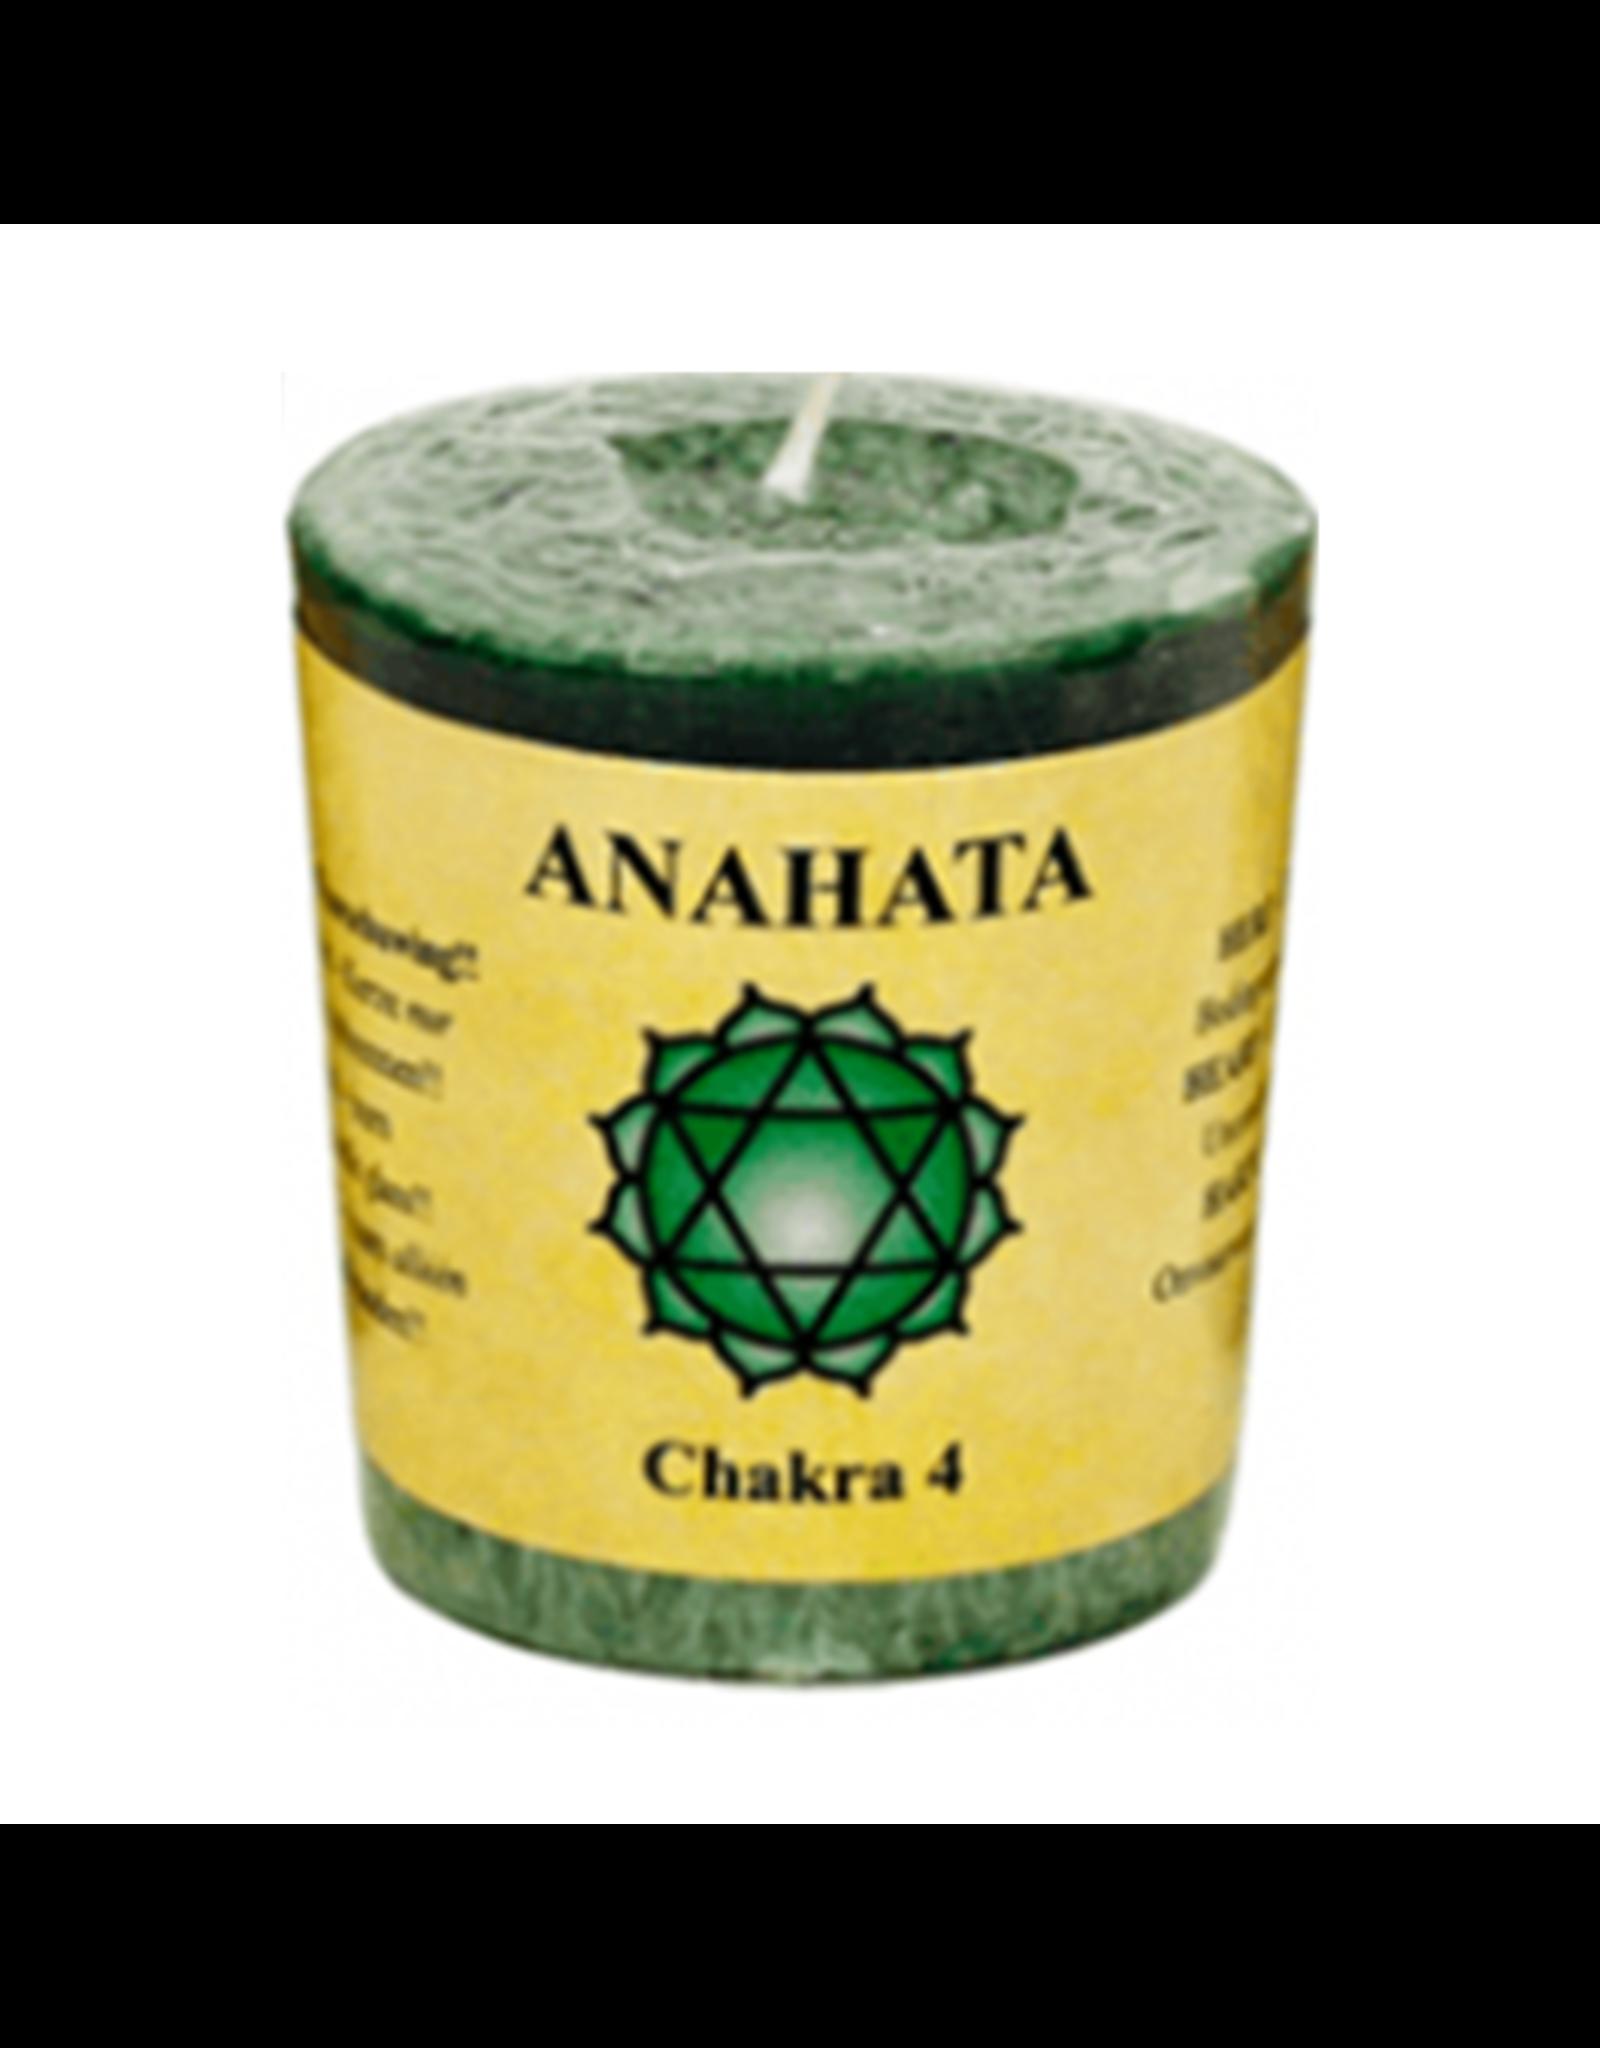 Yogi & Yogini Chakra Candle 4 Anahata